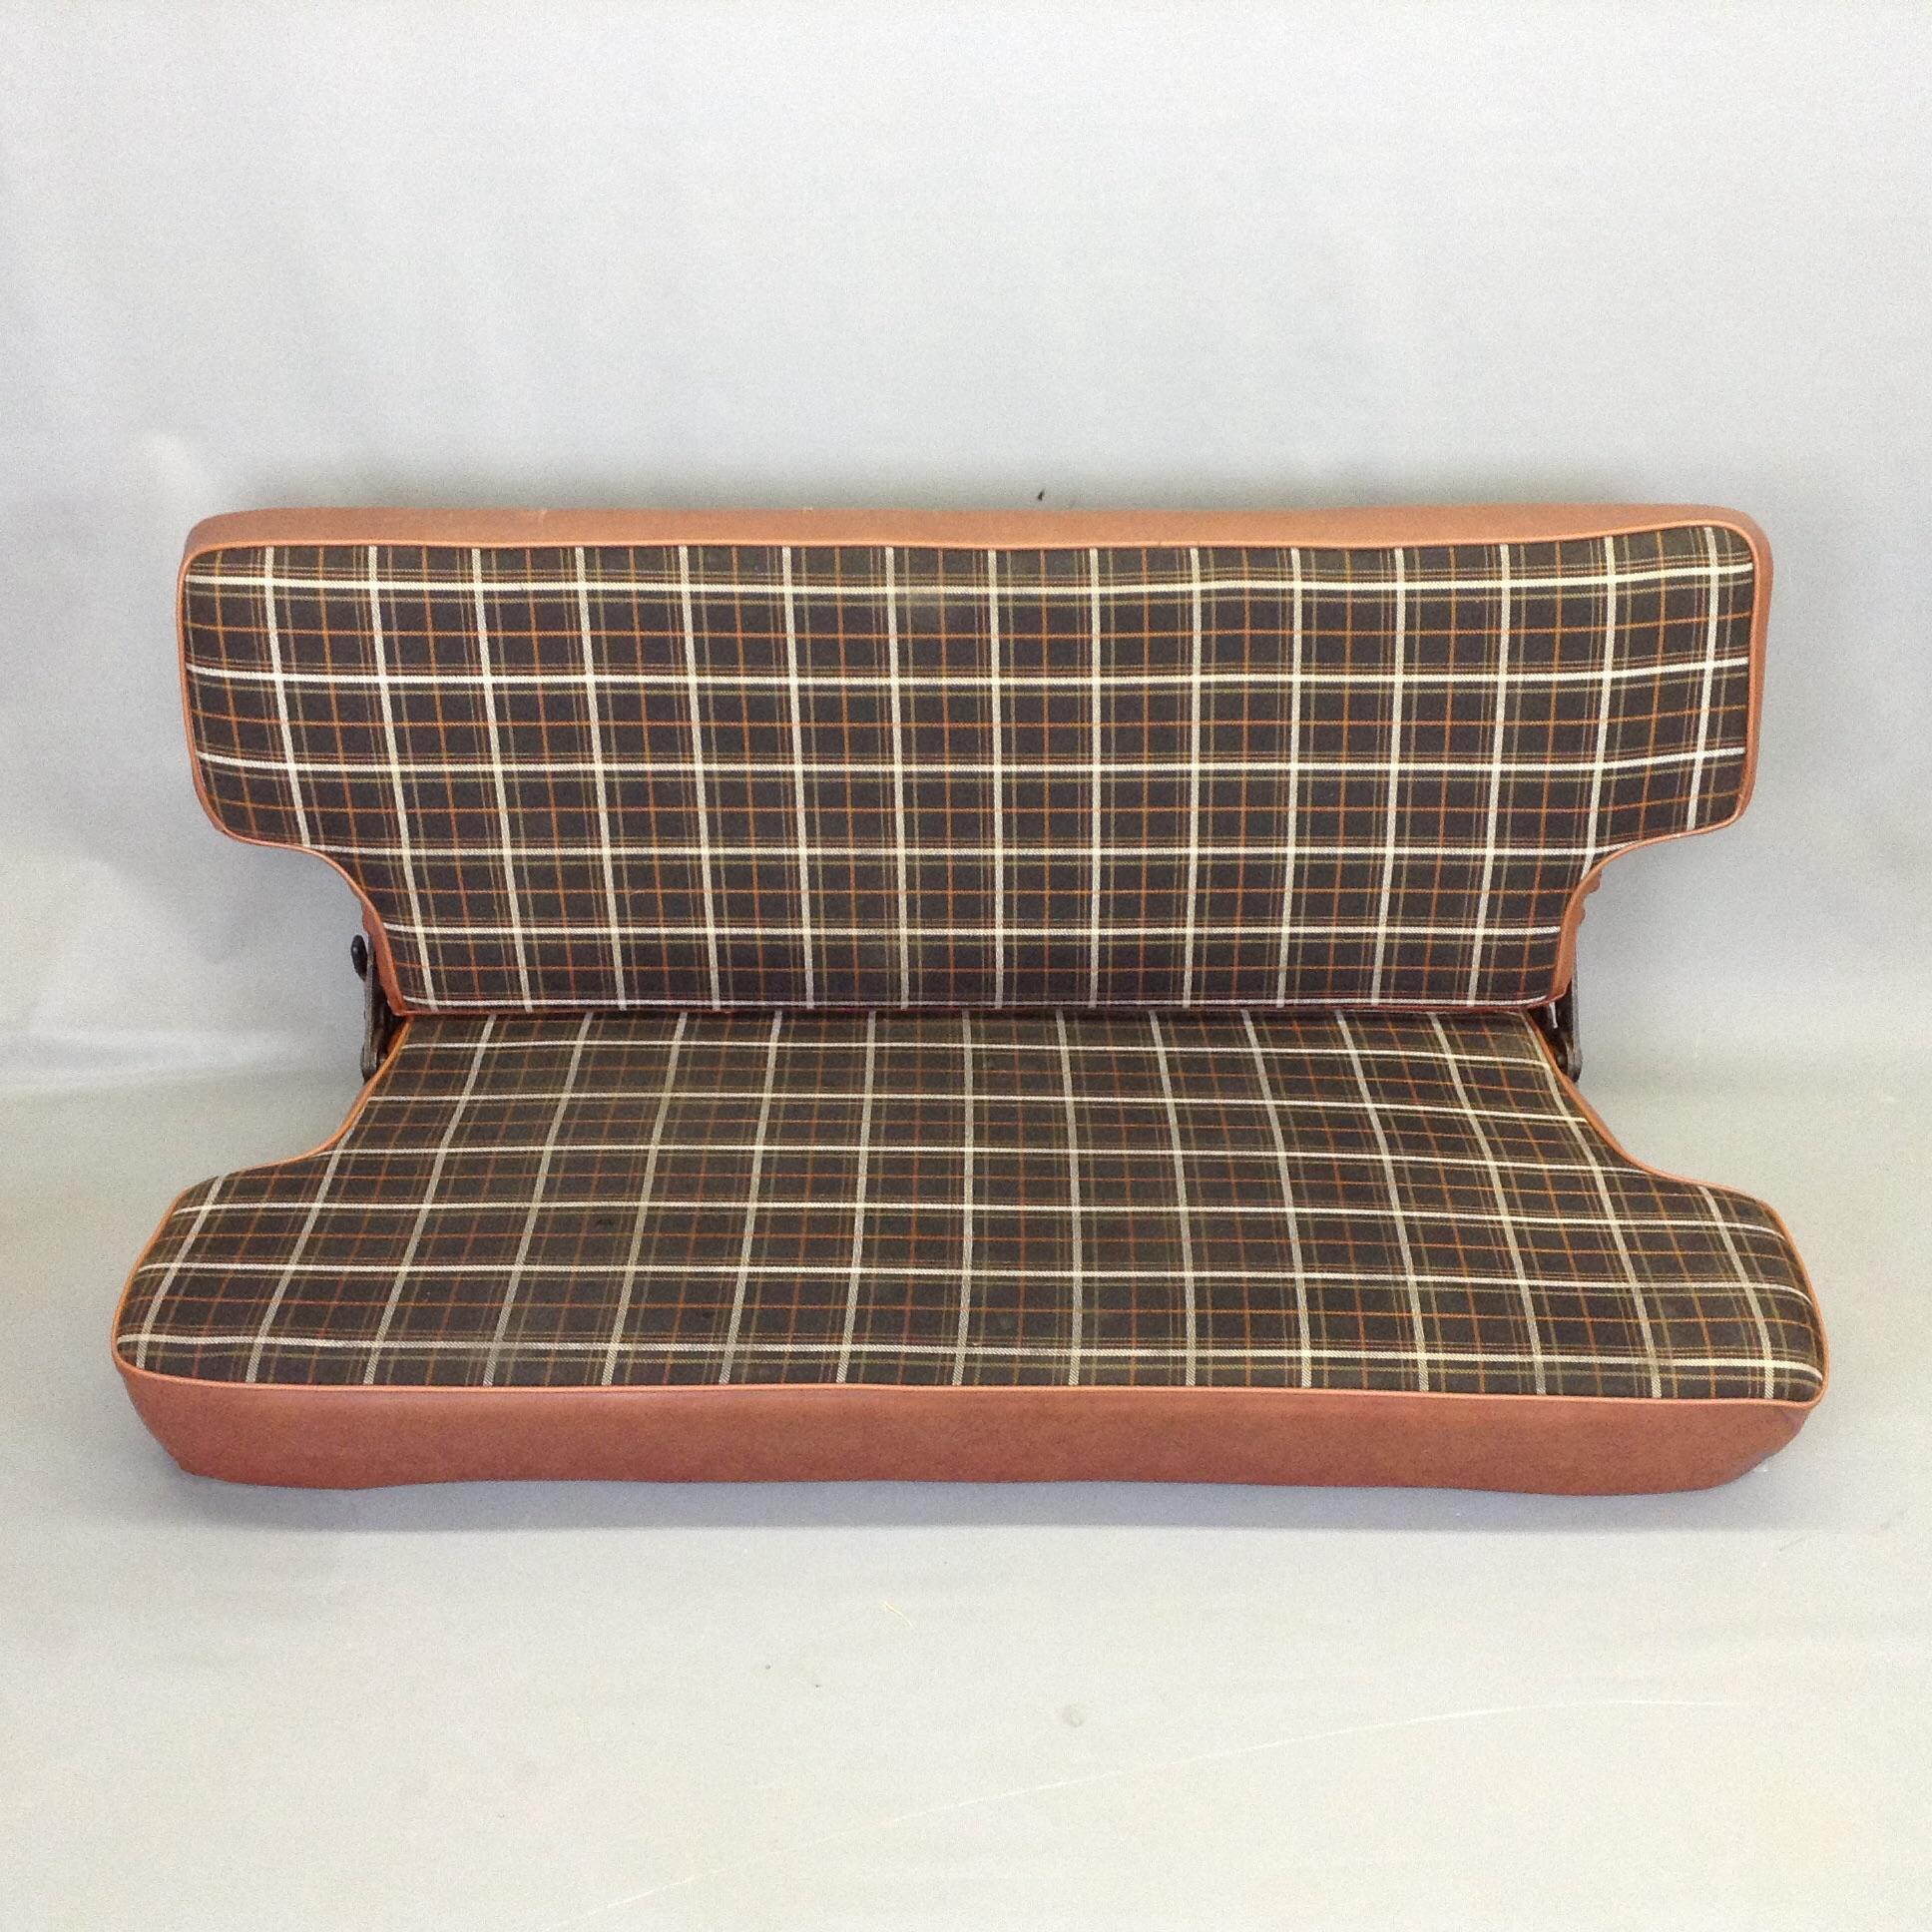 Pleasing Scout Ii Russett Plaid Rear Bench Seat Dailytribune Chair Design For Home Dailytribuneorg